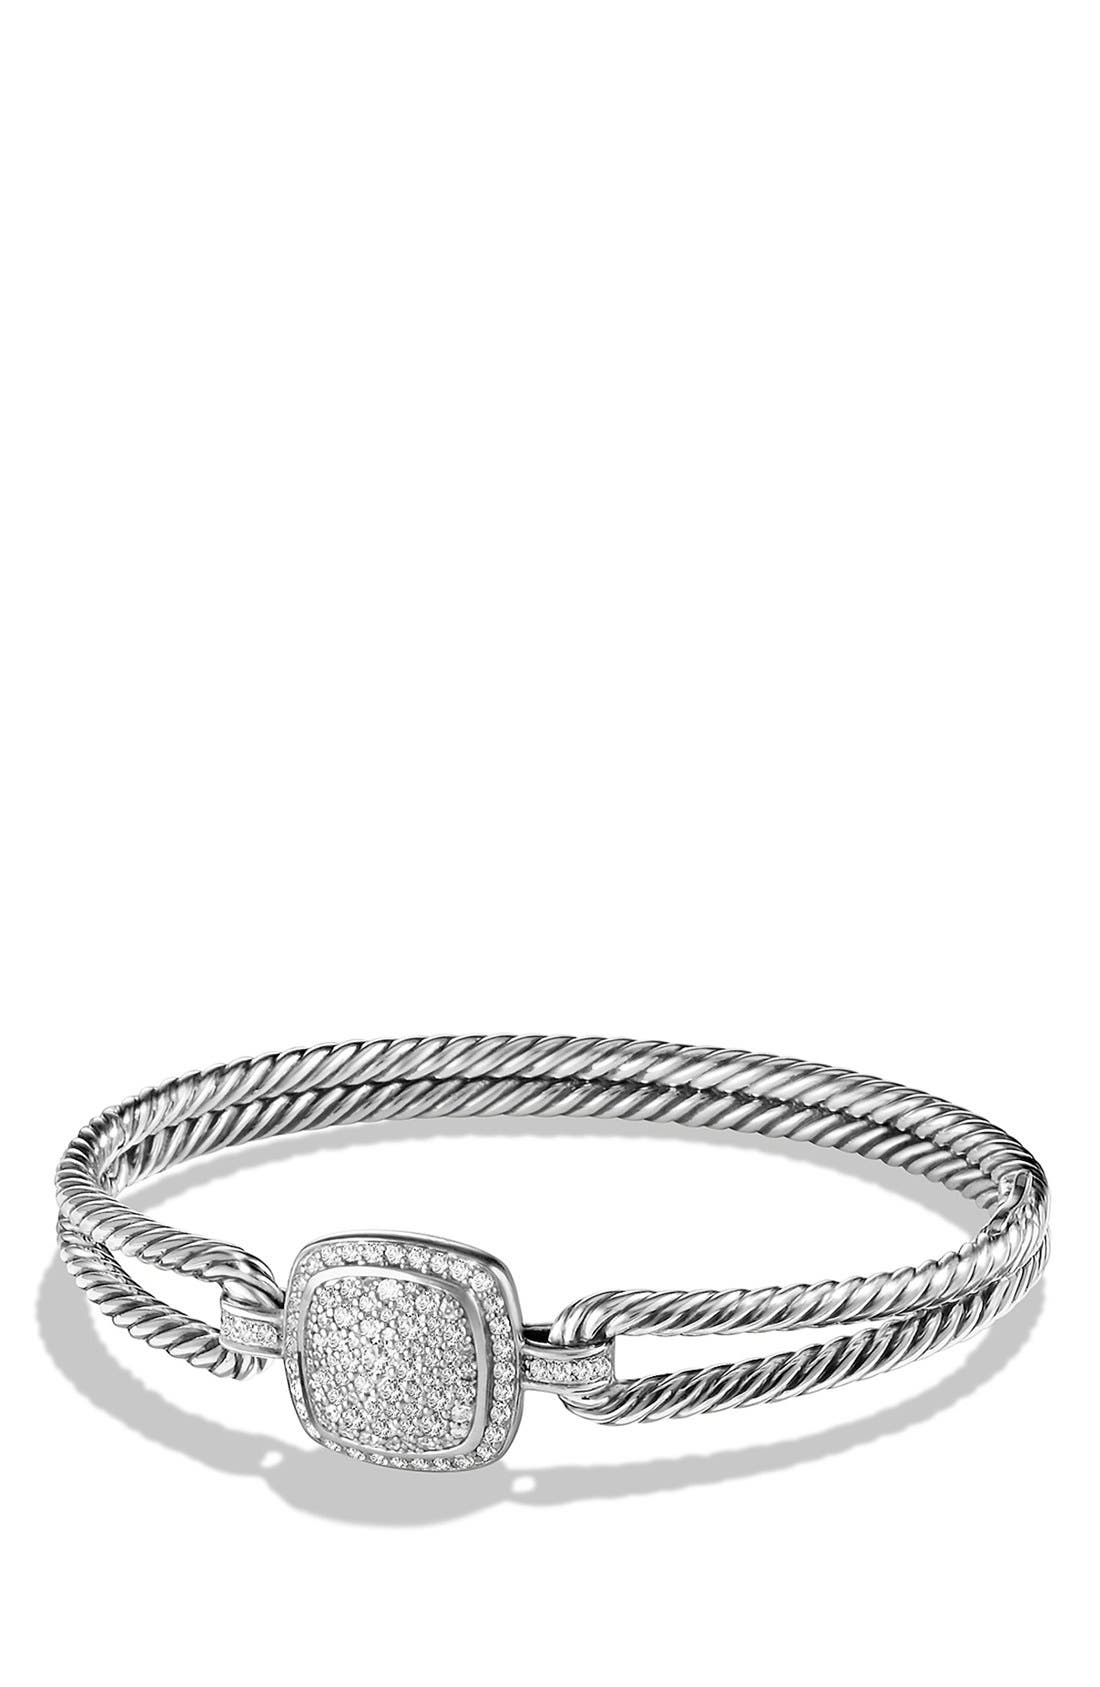 'Albion' Bracelet with Diamonds,                         Main,                         color, DIAMOND